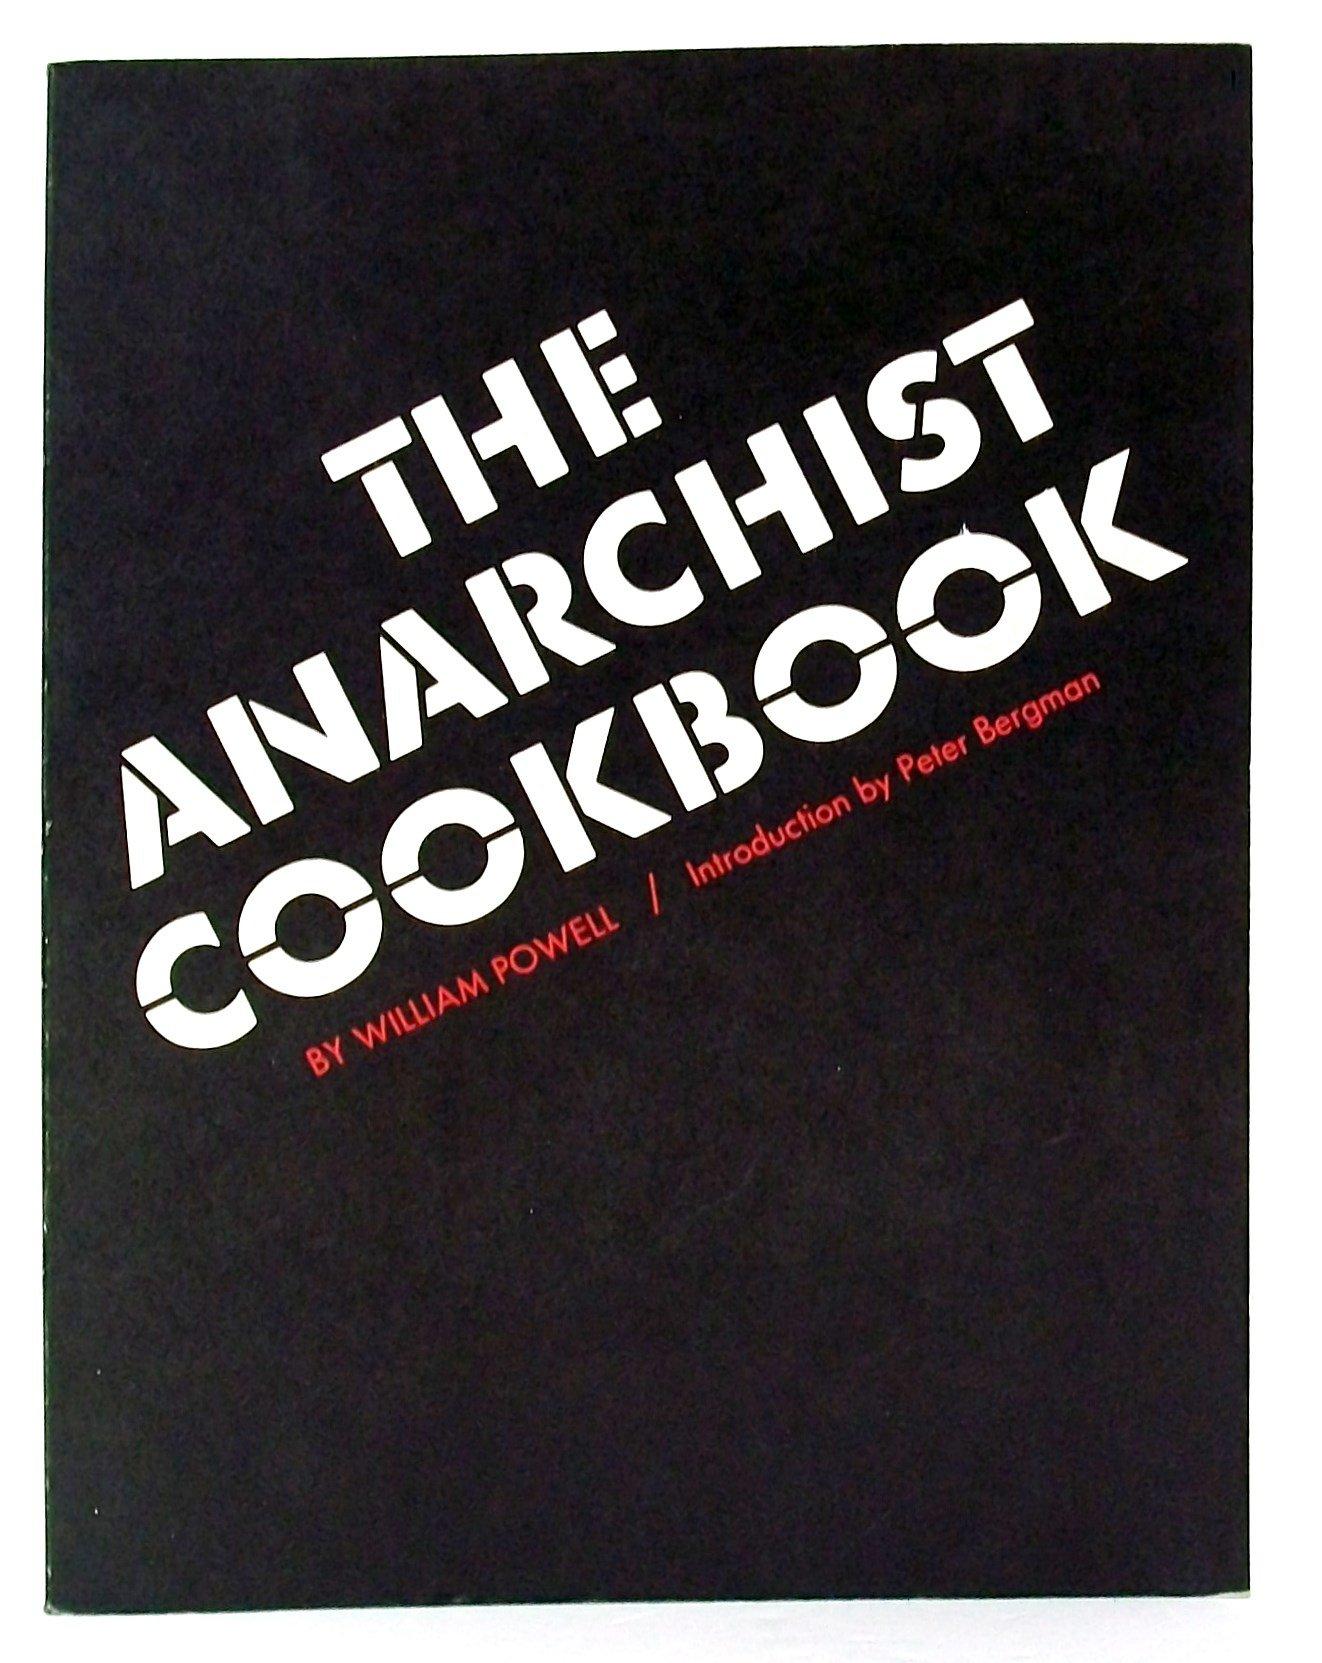 the anarchist cookbook william powell peter bergman 9780962303203